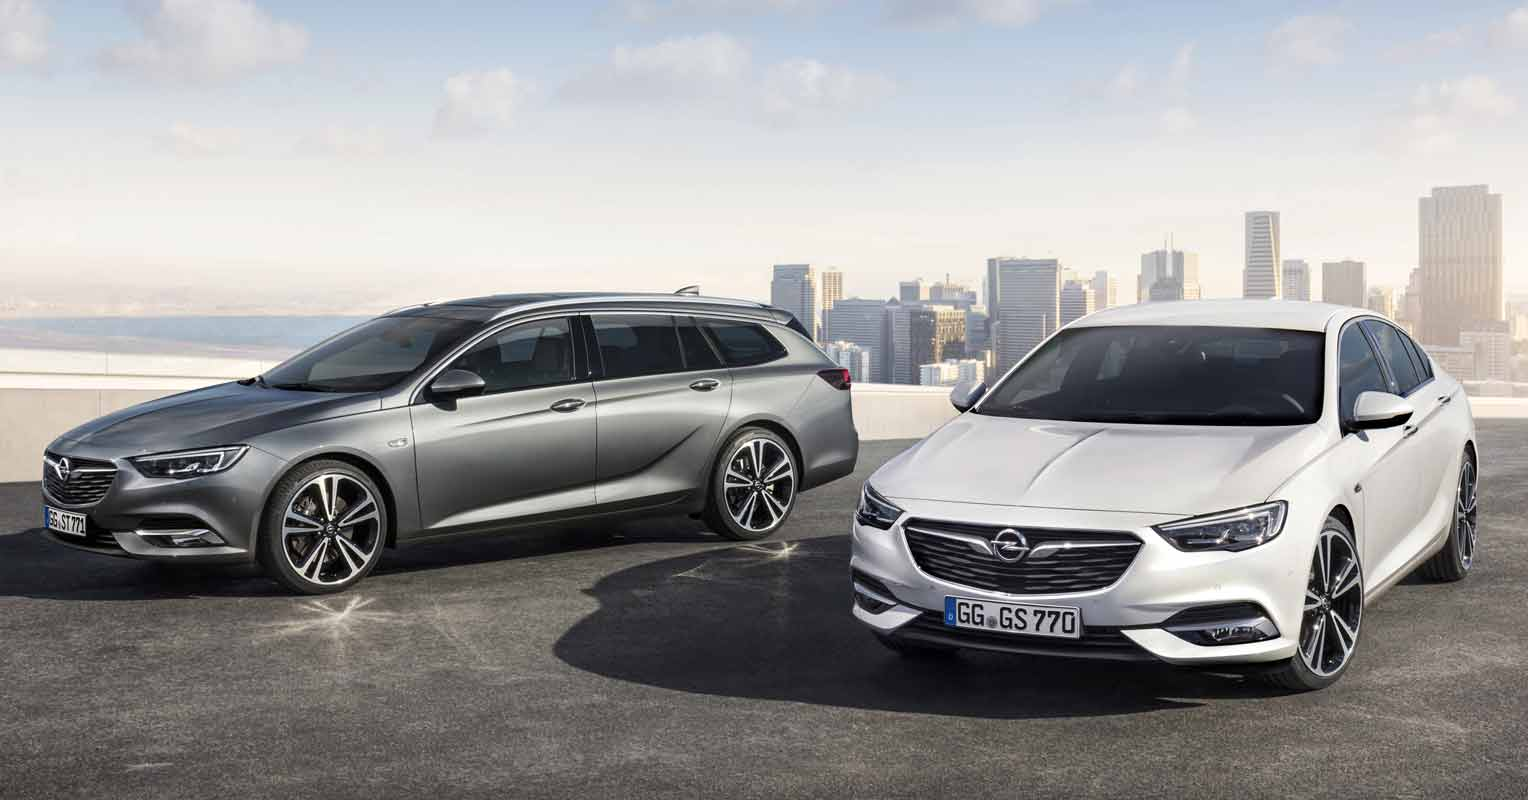 La gamme 2019 de l'Opel Insignia lance équipements et tarifs